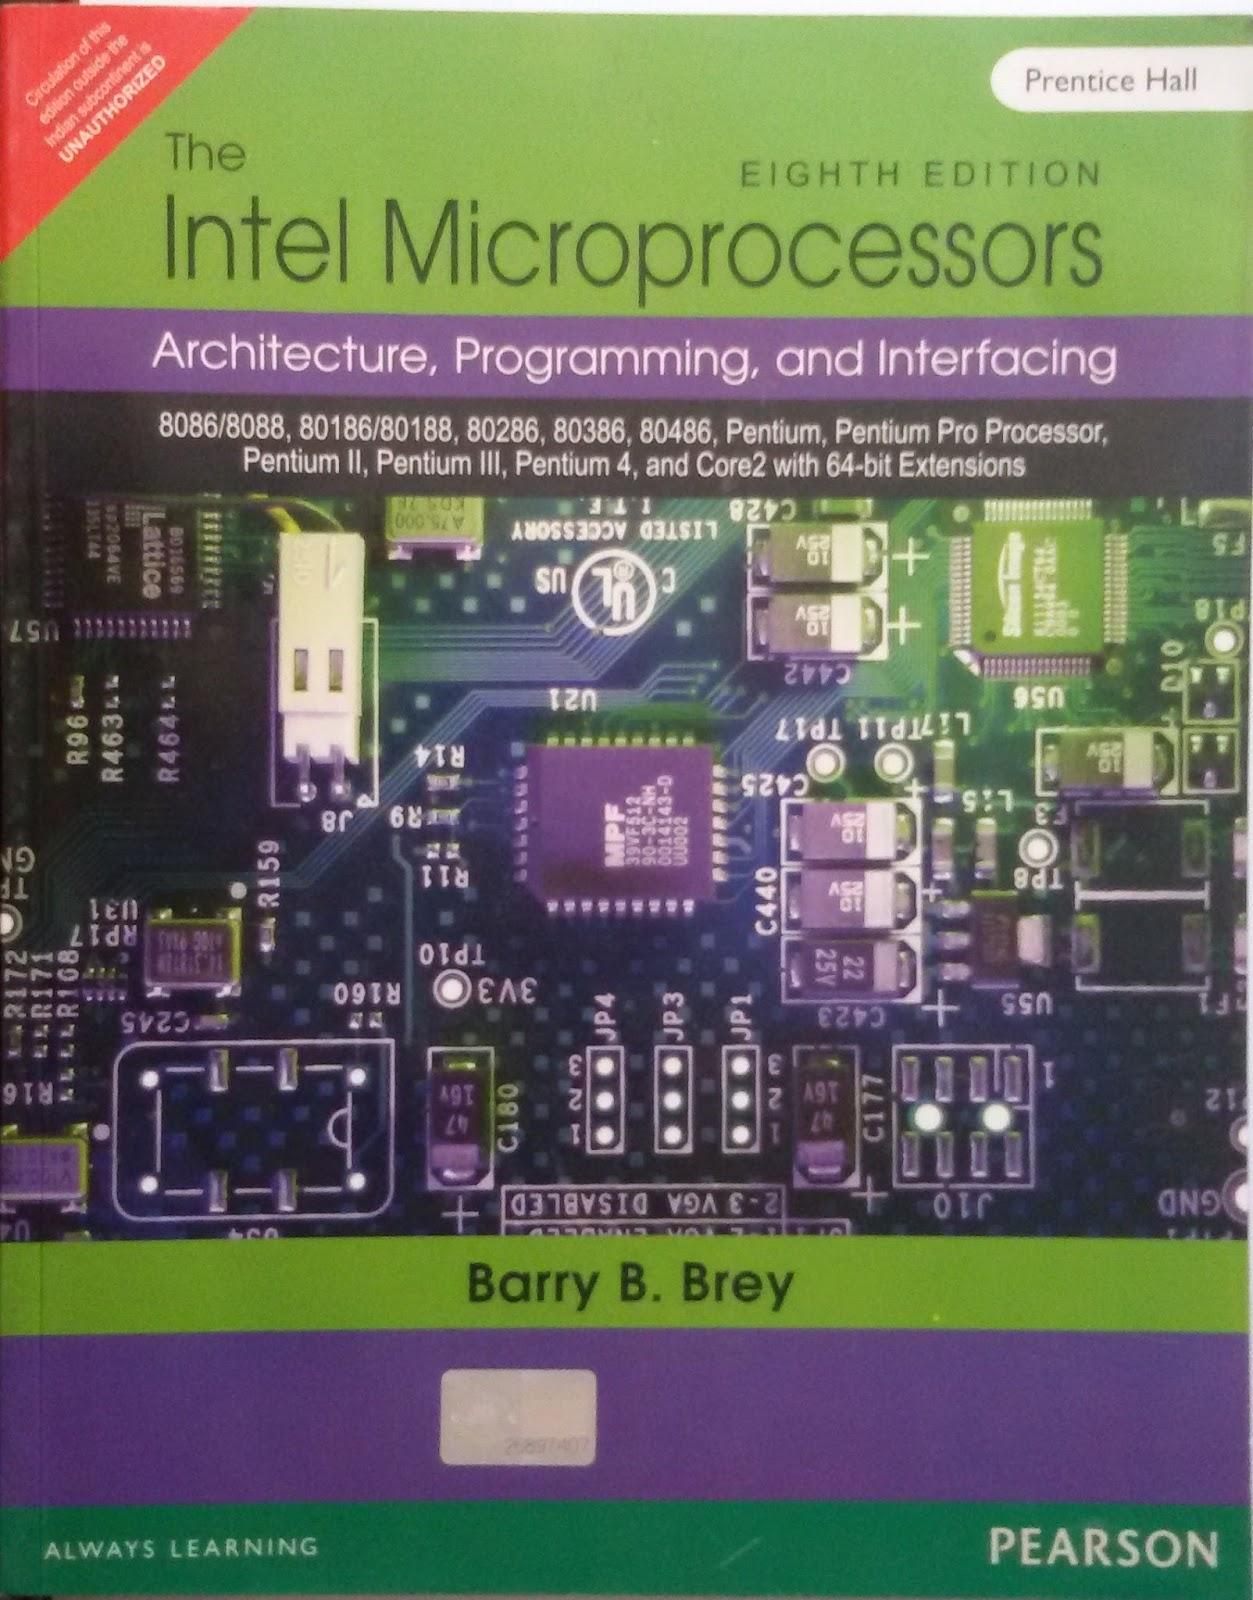 80386 Microprocessor Pdf